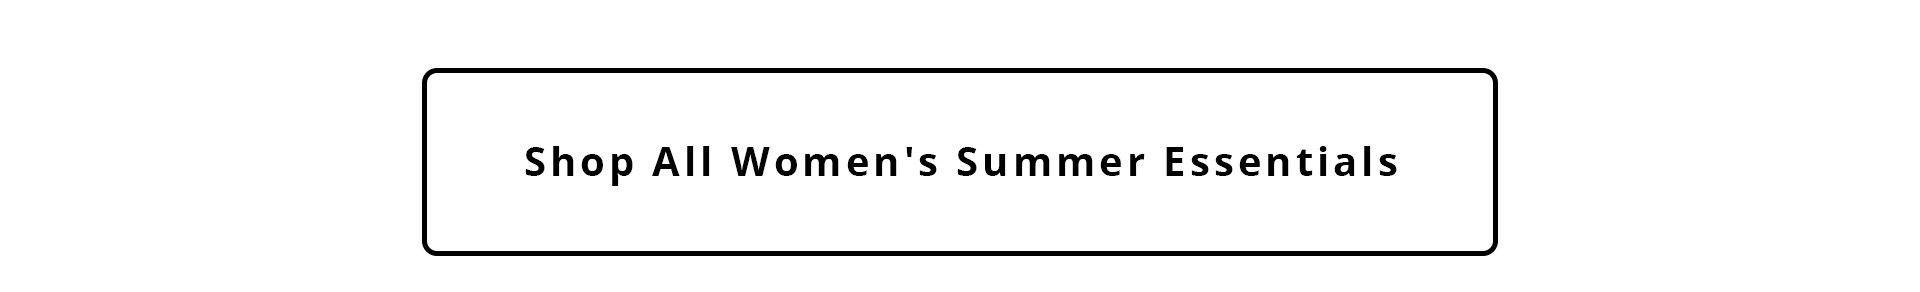 Shop All Women's Summer Essentials.